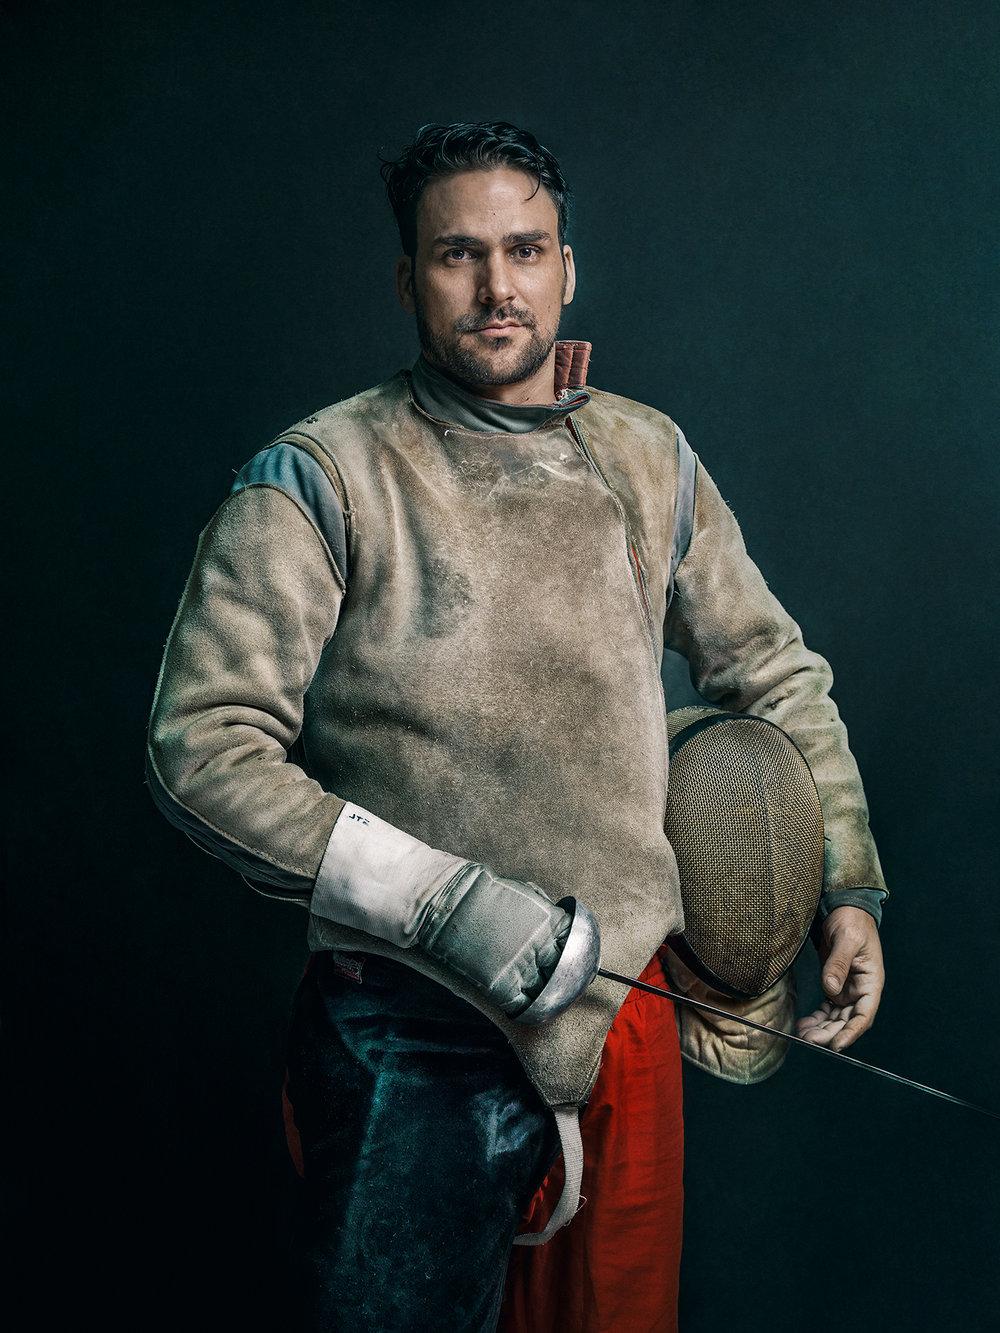 Oscar-arribas-esgrima-maestro-fencing-master-fencer-fechten-scherma-escrime-portrait-fotografo-retrato-photographer014.jpg